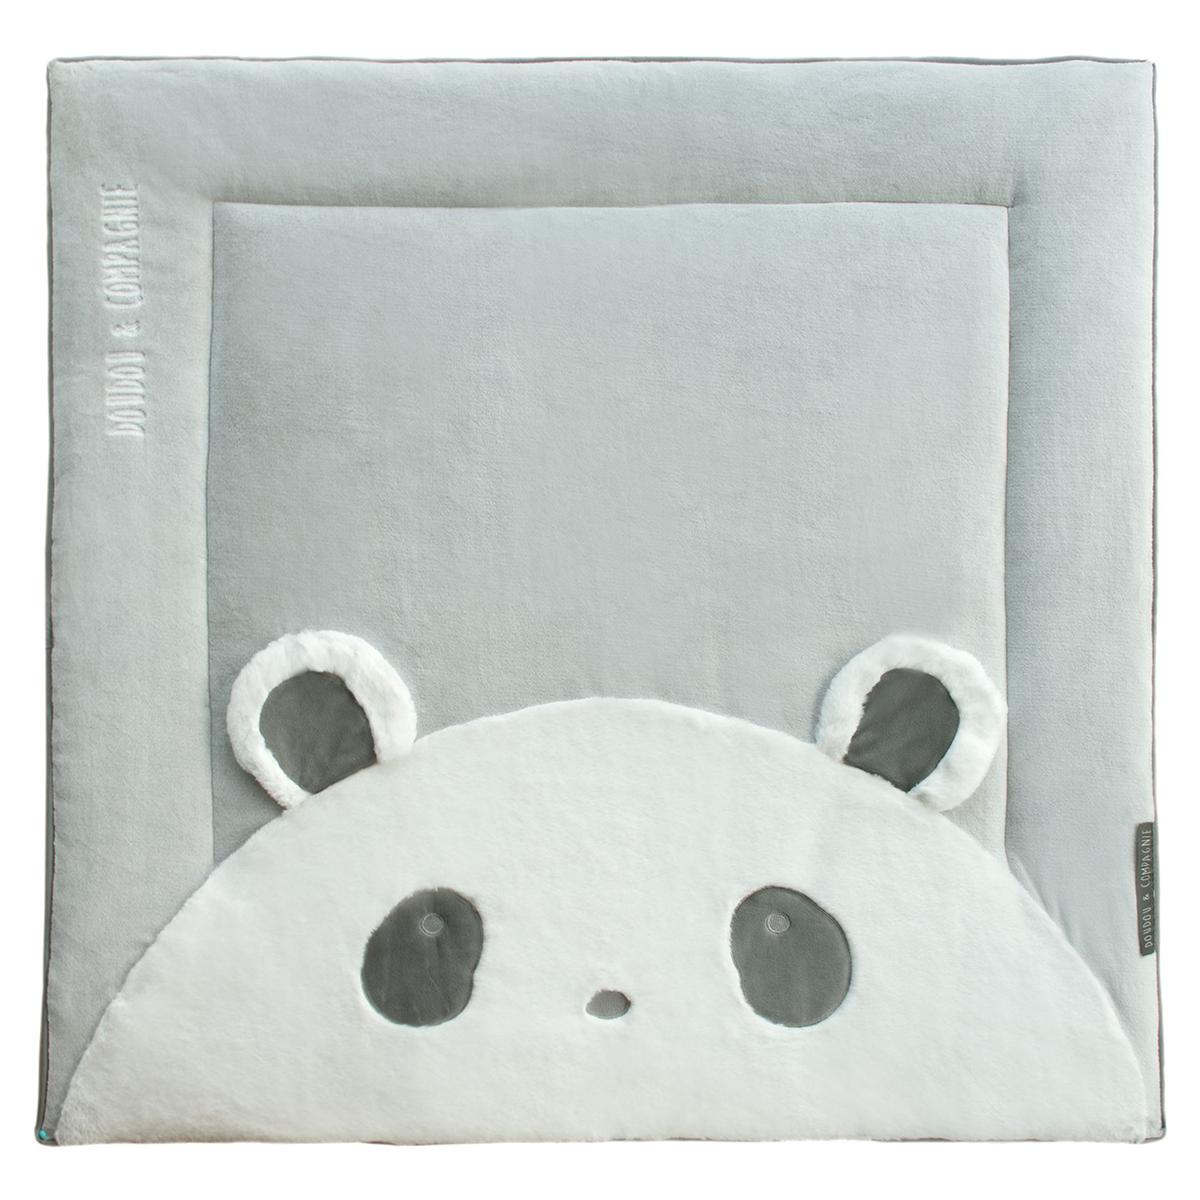 Tapis Tapidou Panda - 100 x 100 cm Tapidou Panda - 100 x 100 cm